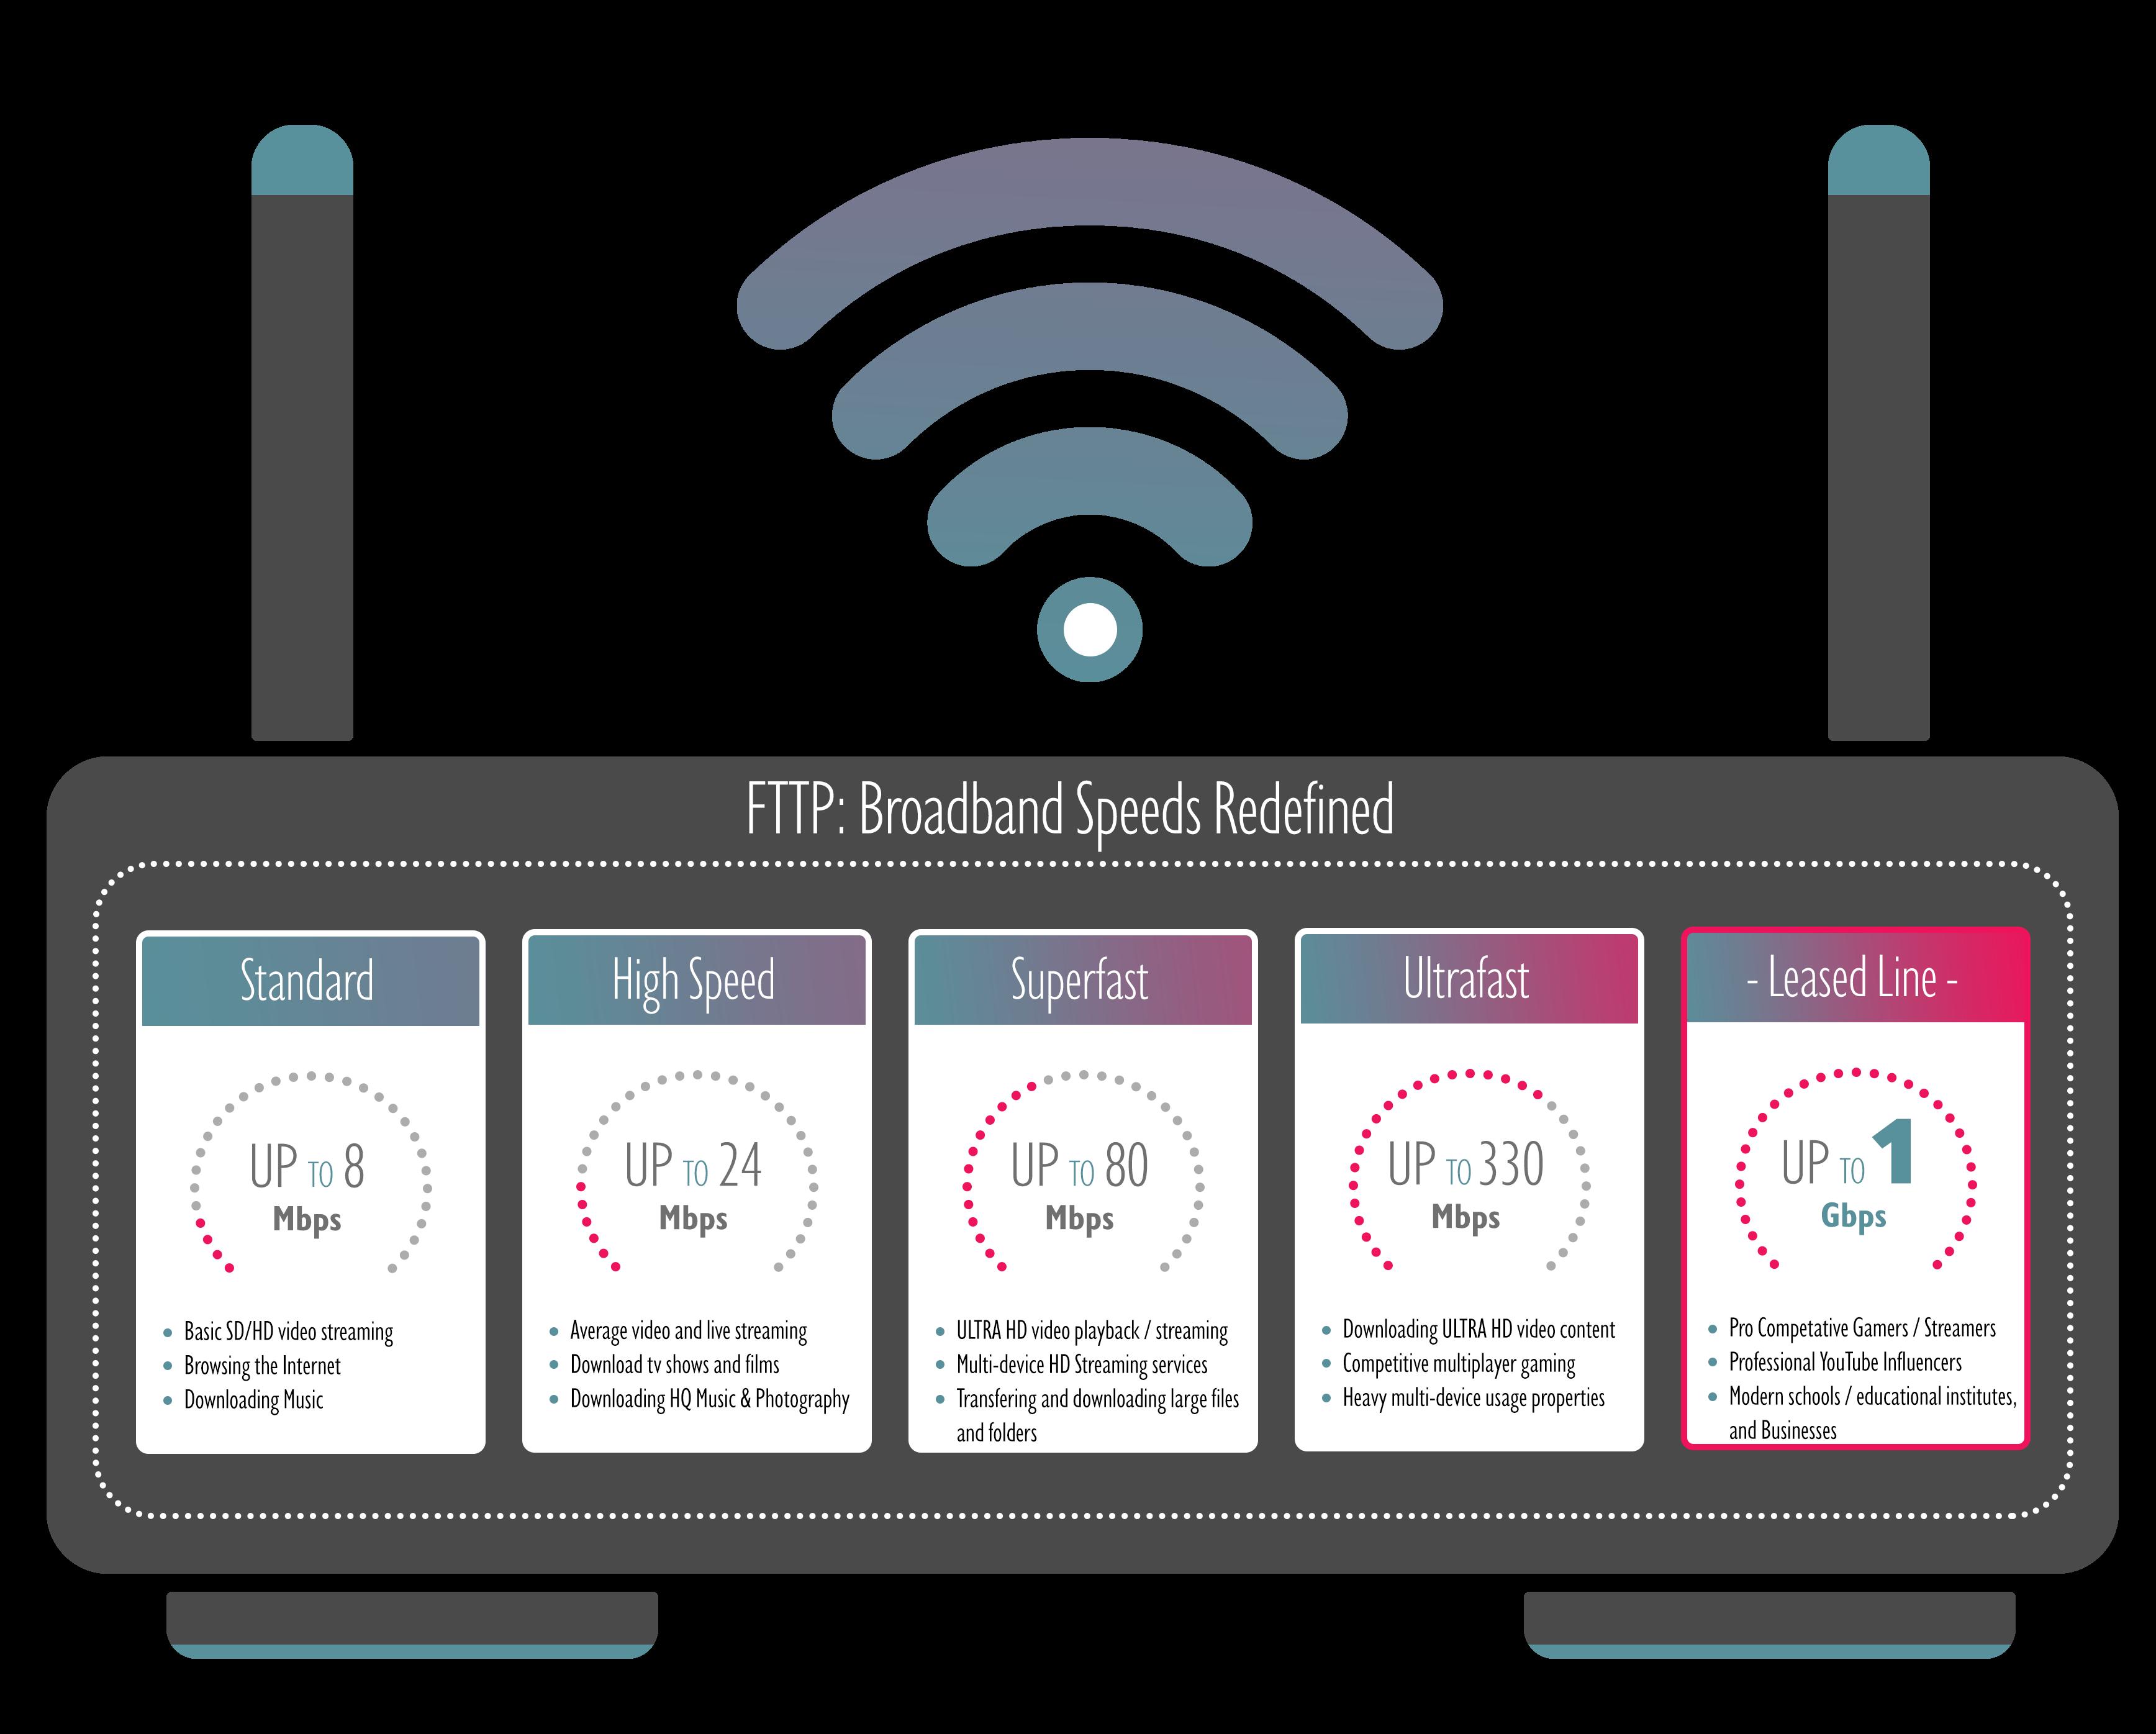 Different broadband speed categories defined